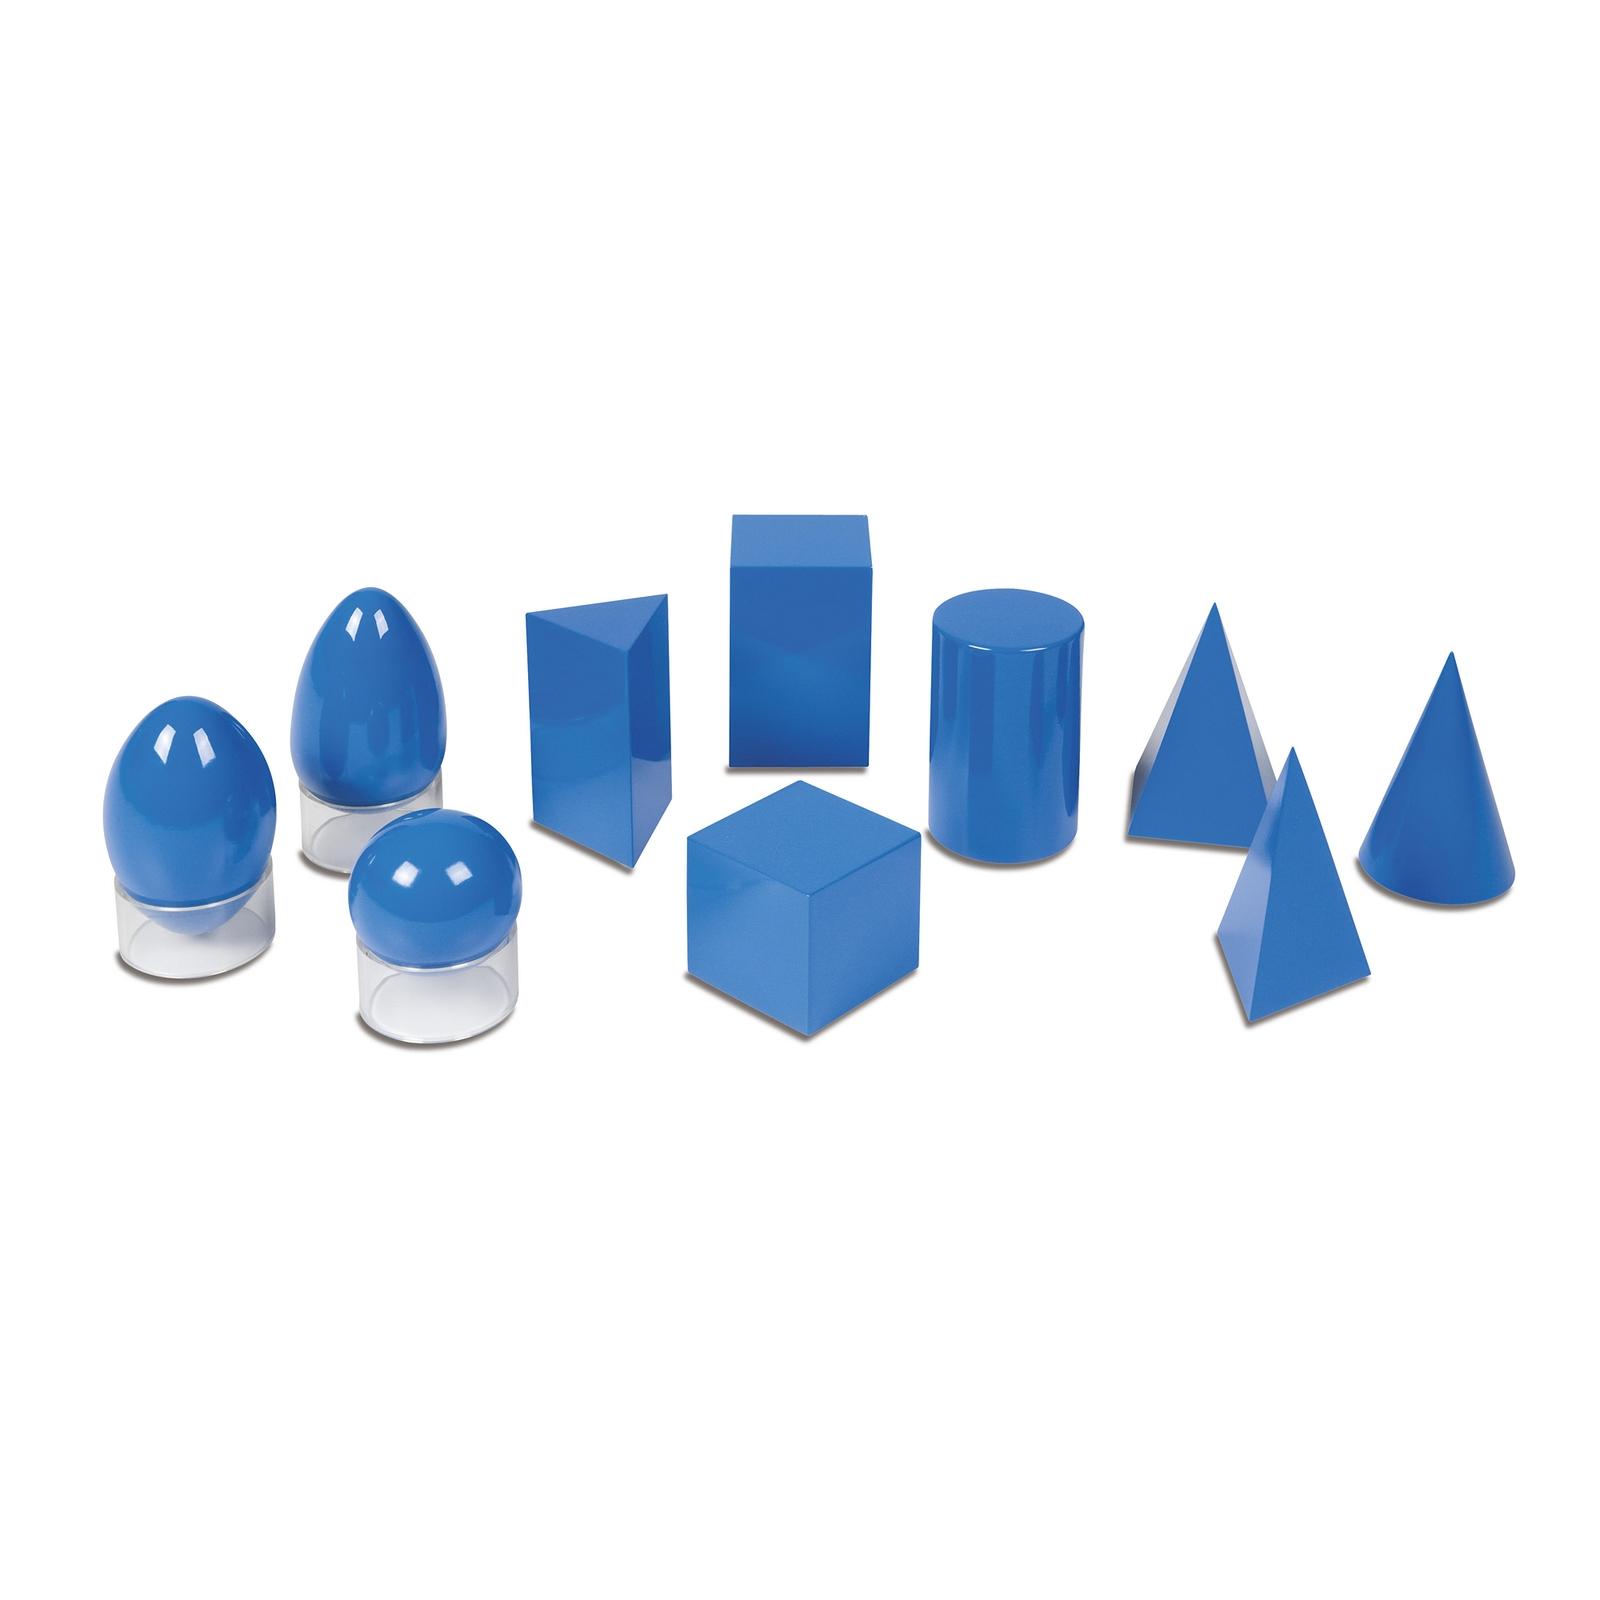 The Geometric Solids